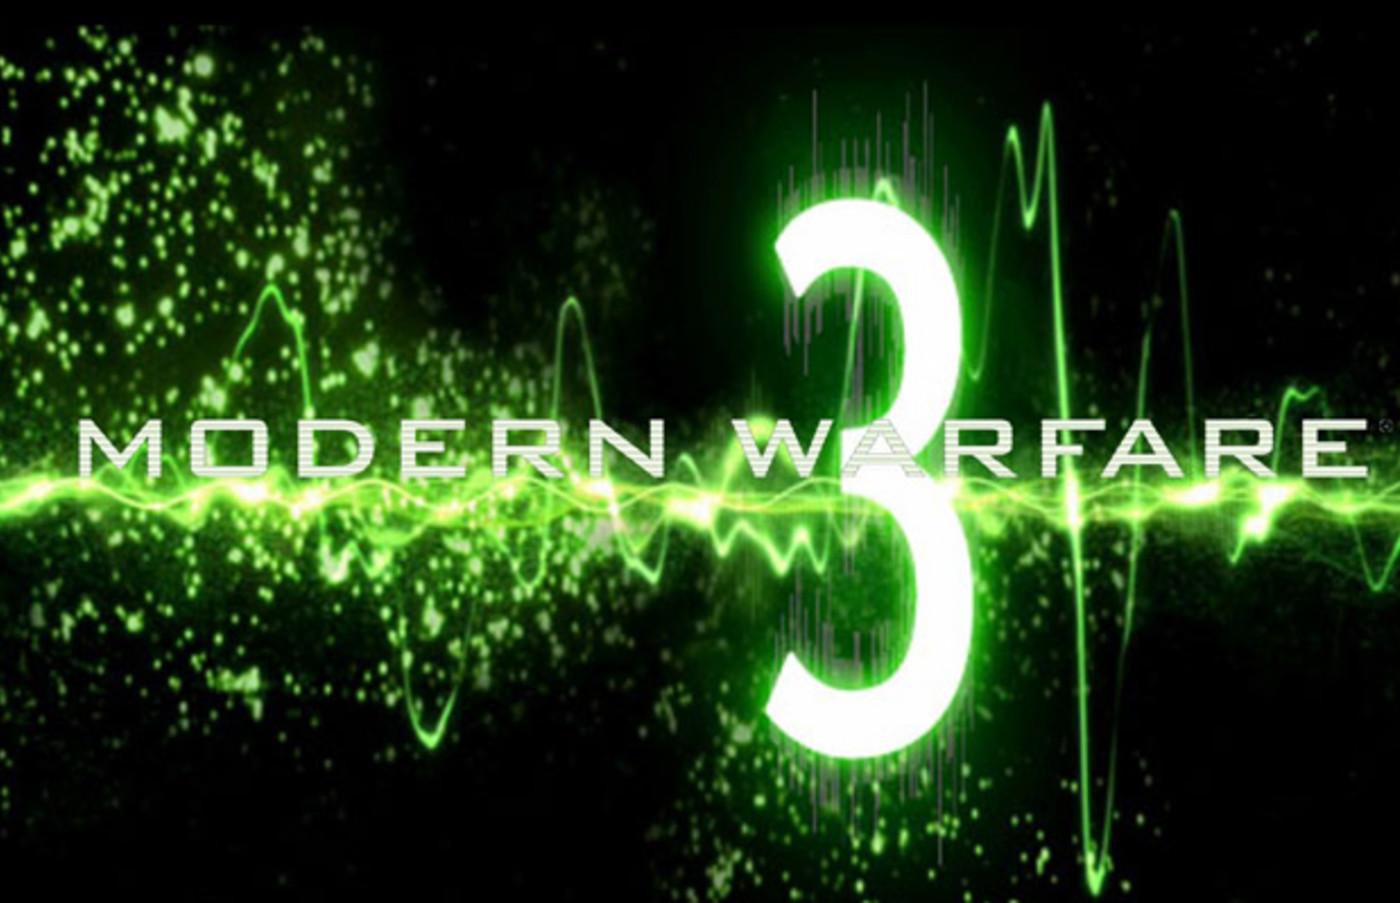 Call Of Duty Modern Warfare 3 Will Release For Nintendo Wii